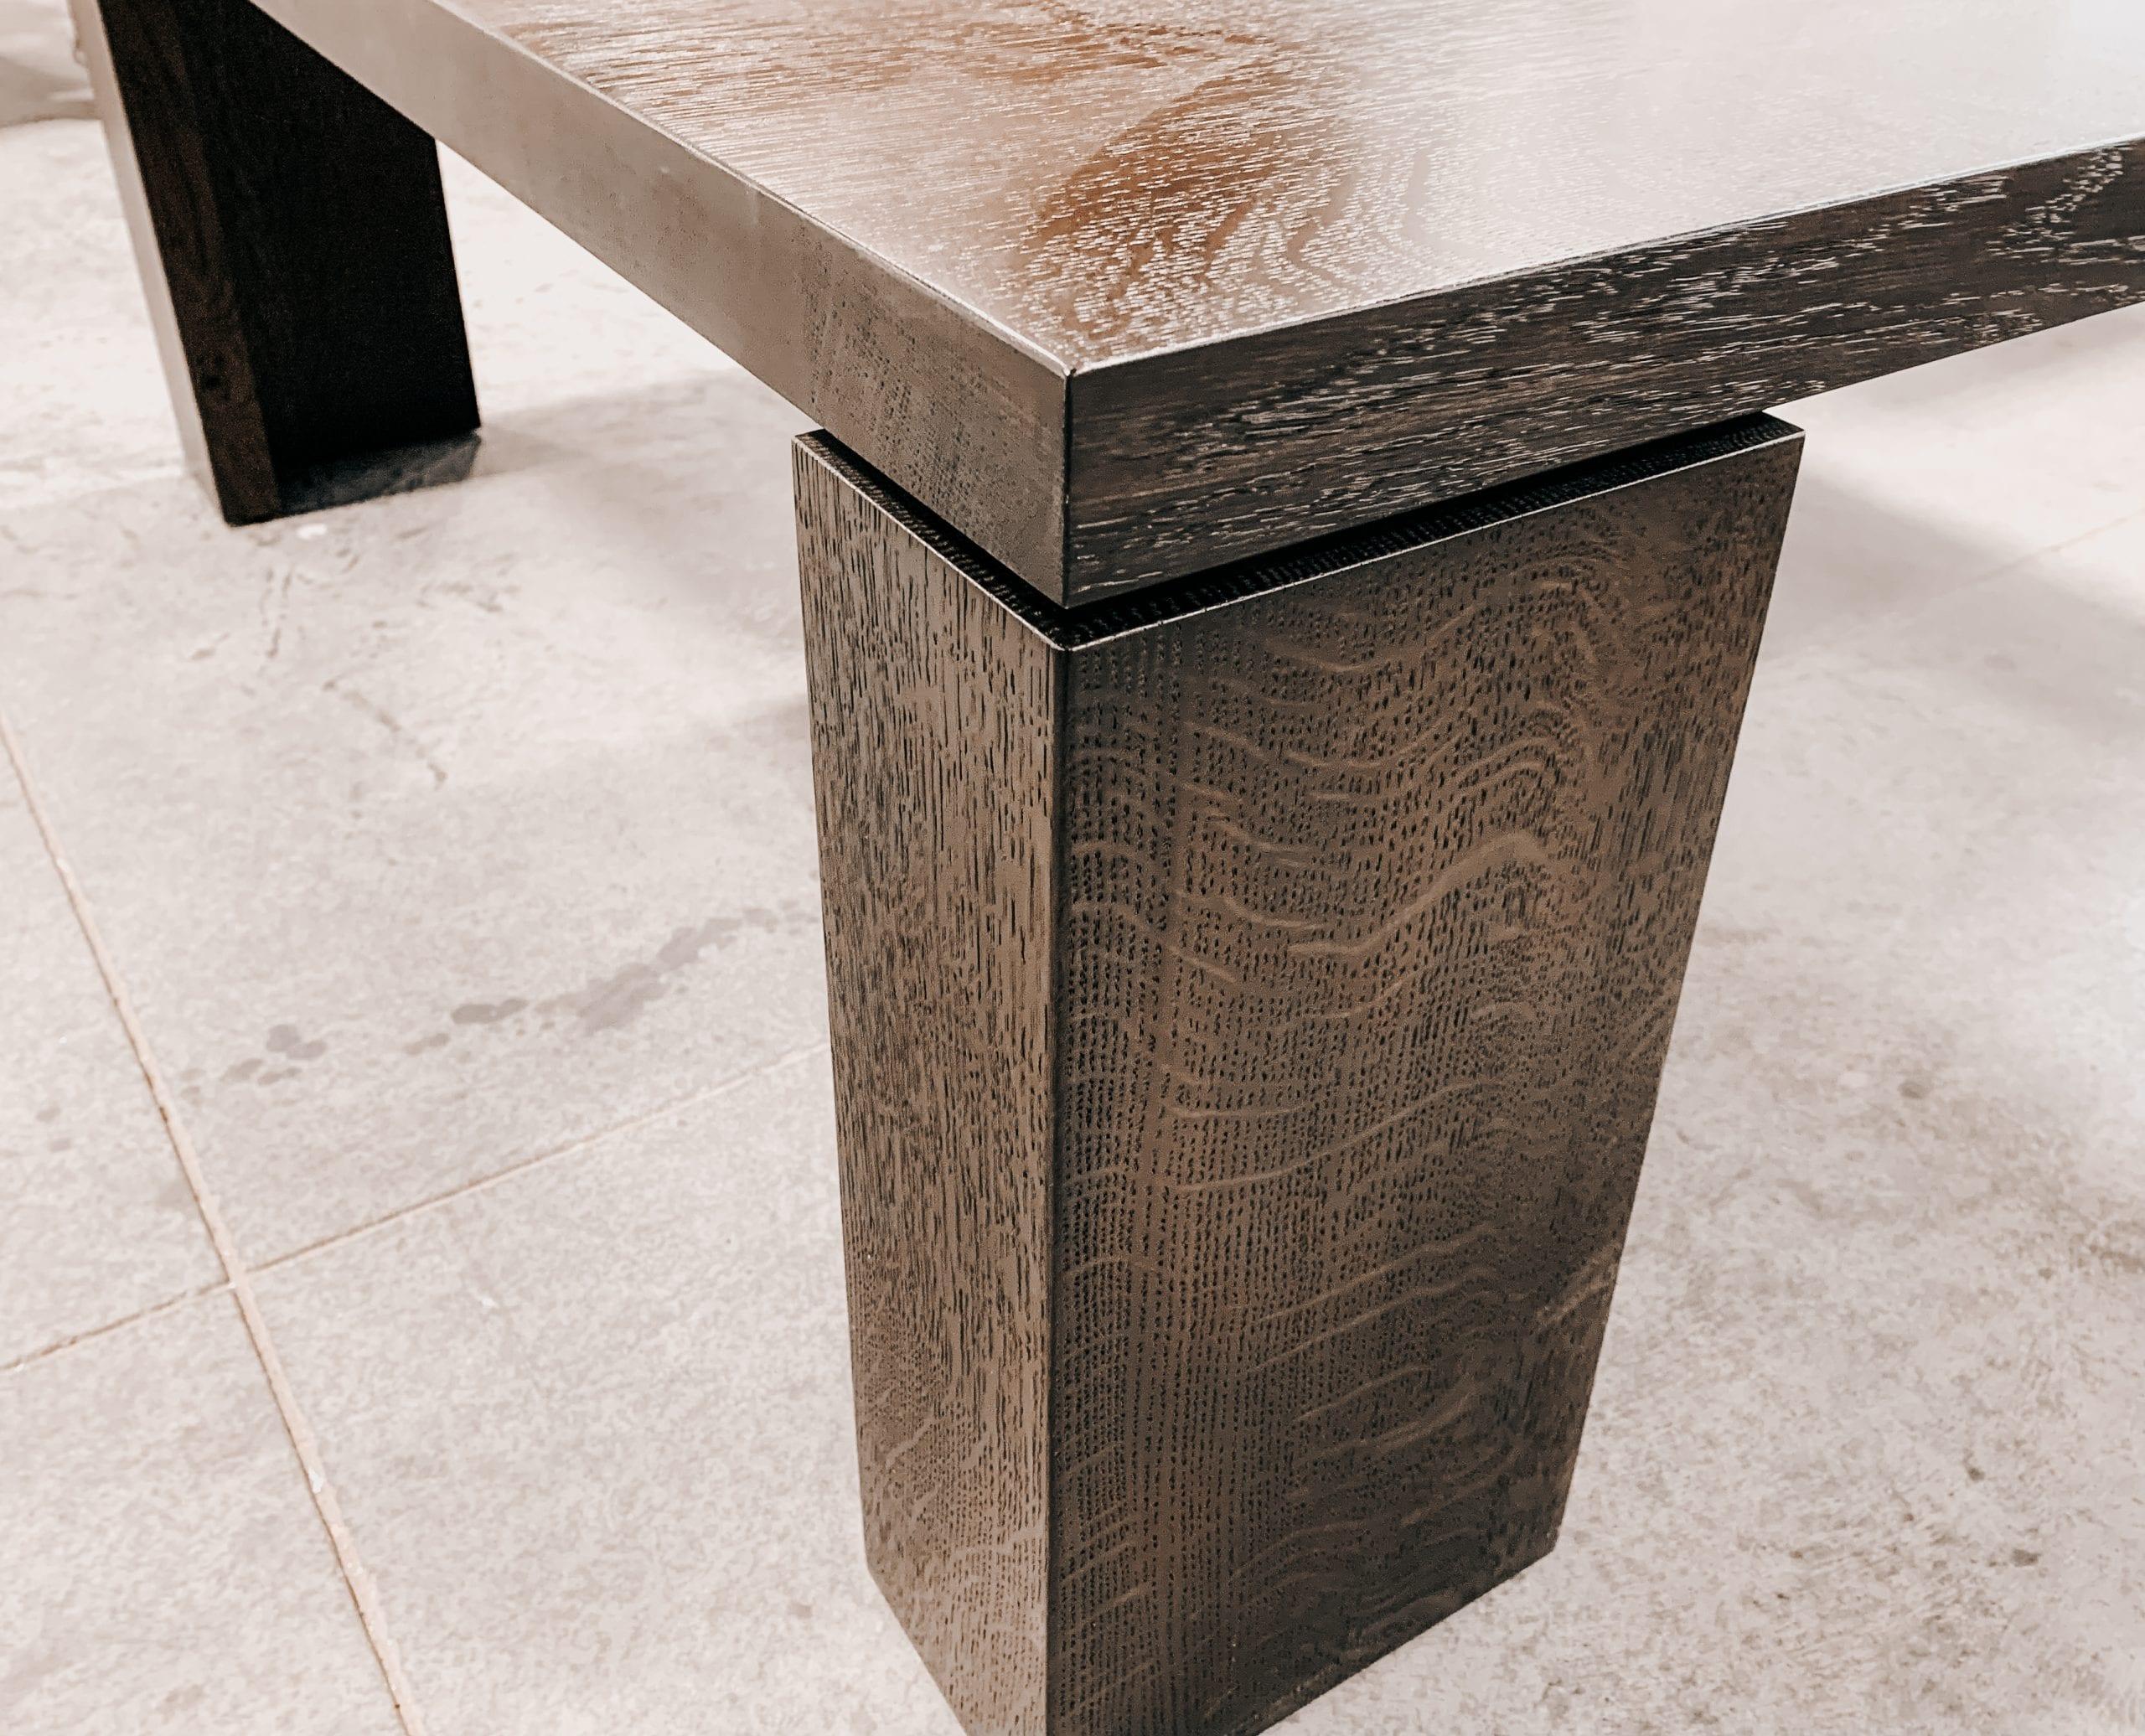 Wood Grain Details on Table Leg